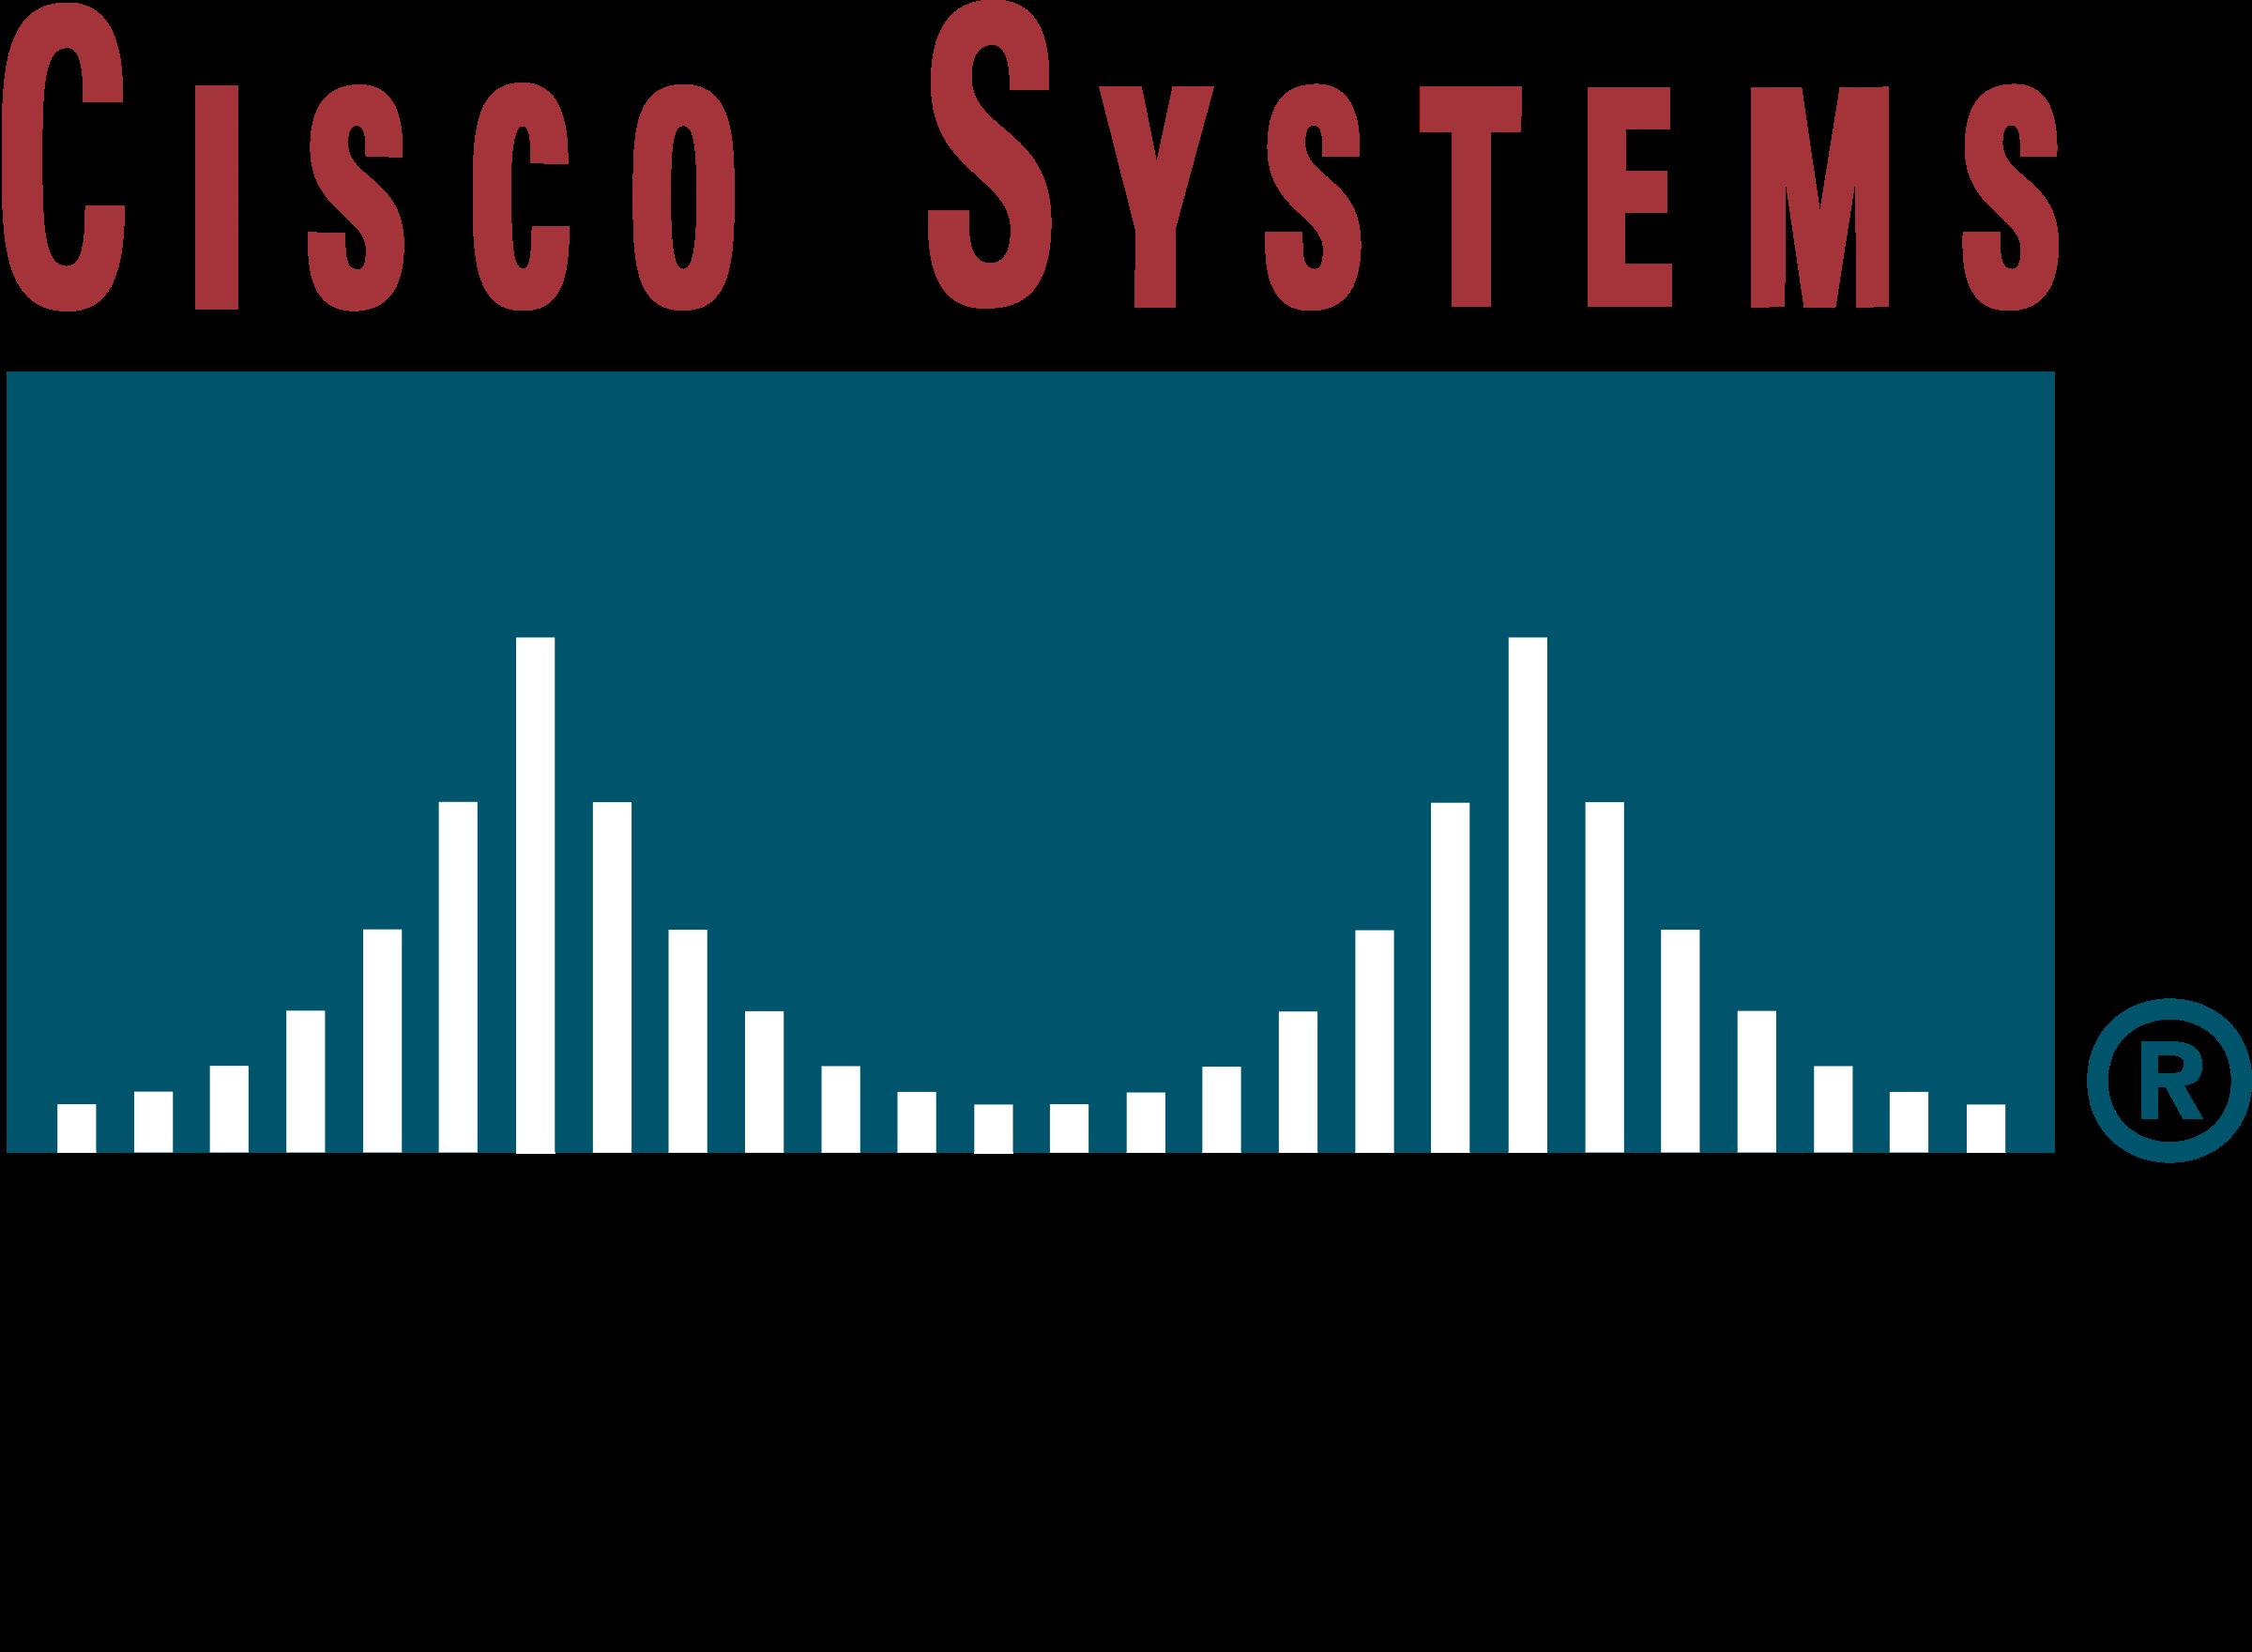 Cisco Systems logo4 Logo PNG Transparent & SVG Vector.